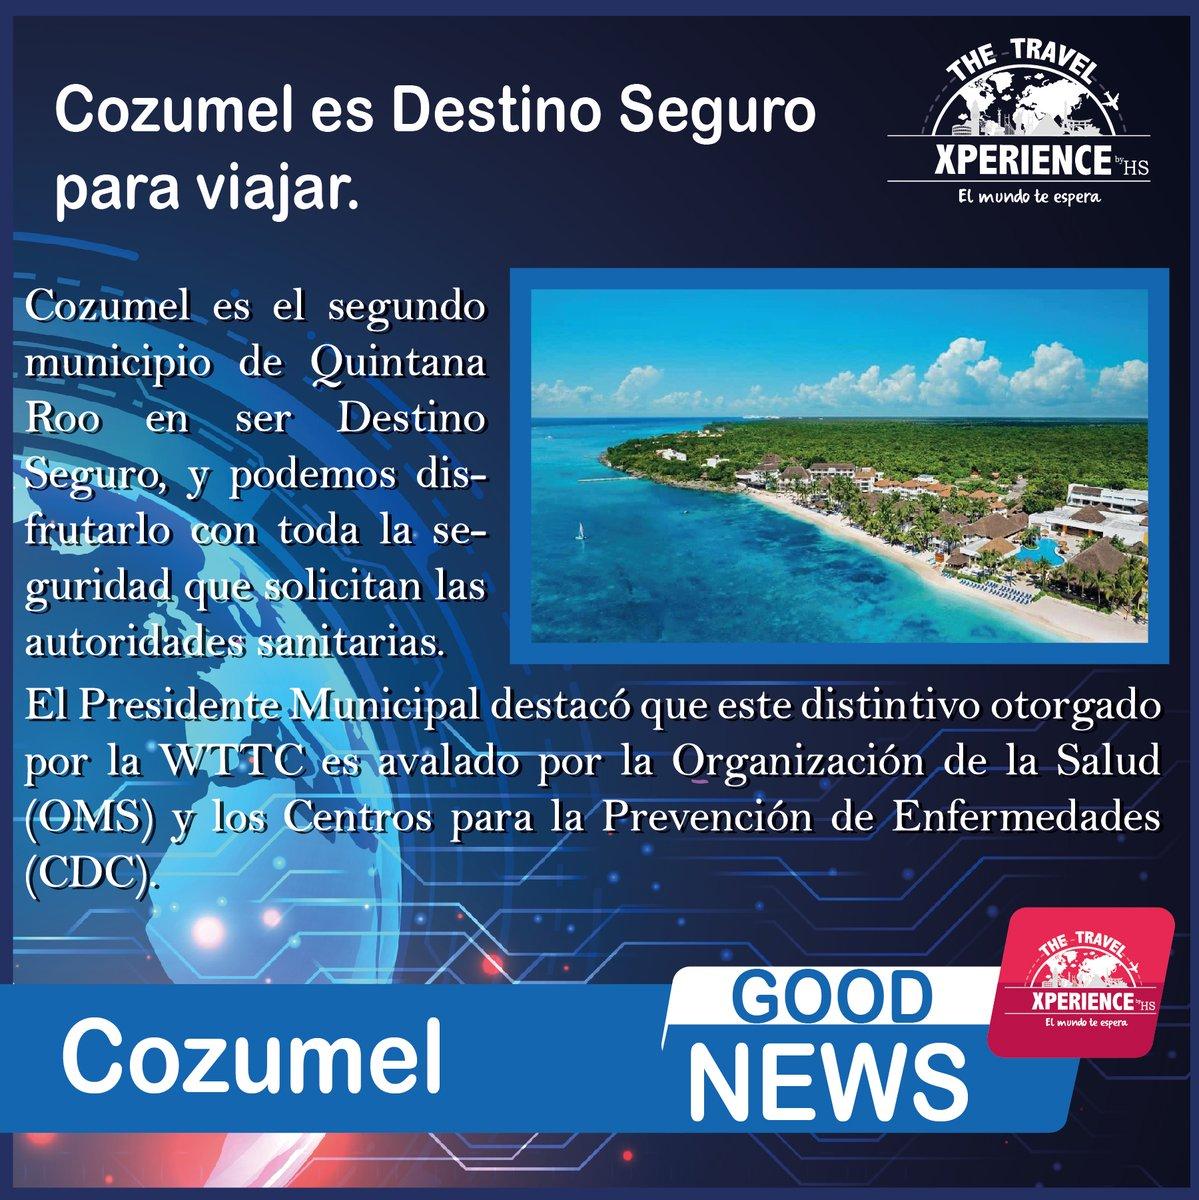 ¡Les tenemos buenas noticias viajeros! #Travel #Turismo #Mexico #FelizViernesATodos #findesemana pic.twitter.com/moPhx7Zn2G